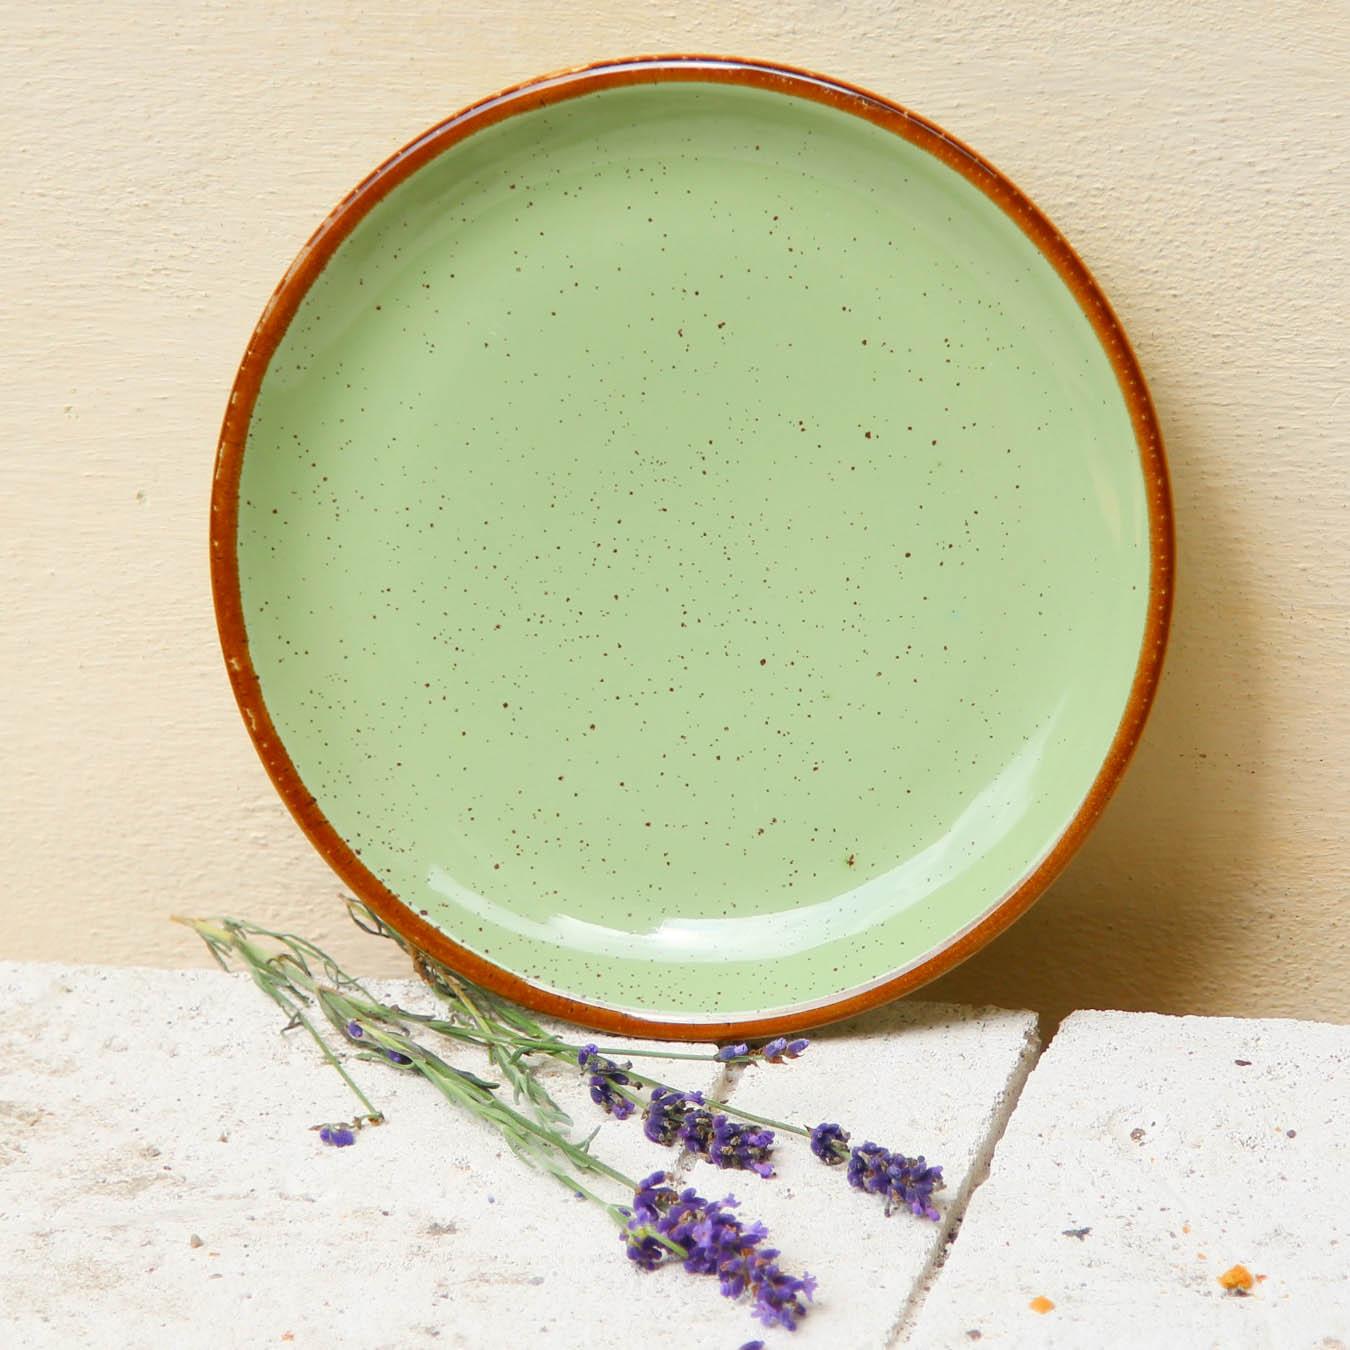 Farfurie de desert Gardena din ceramica verde 20 cm chicville 2021